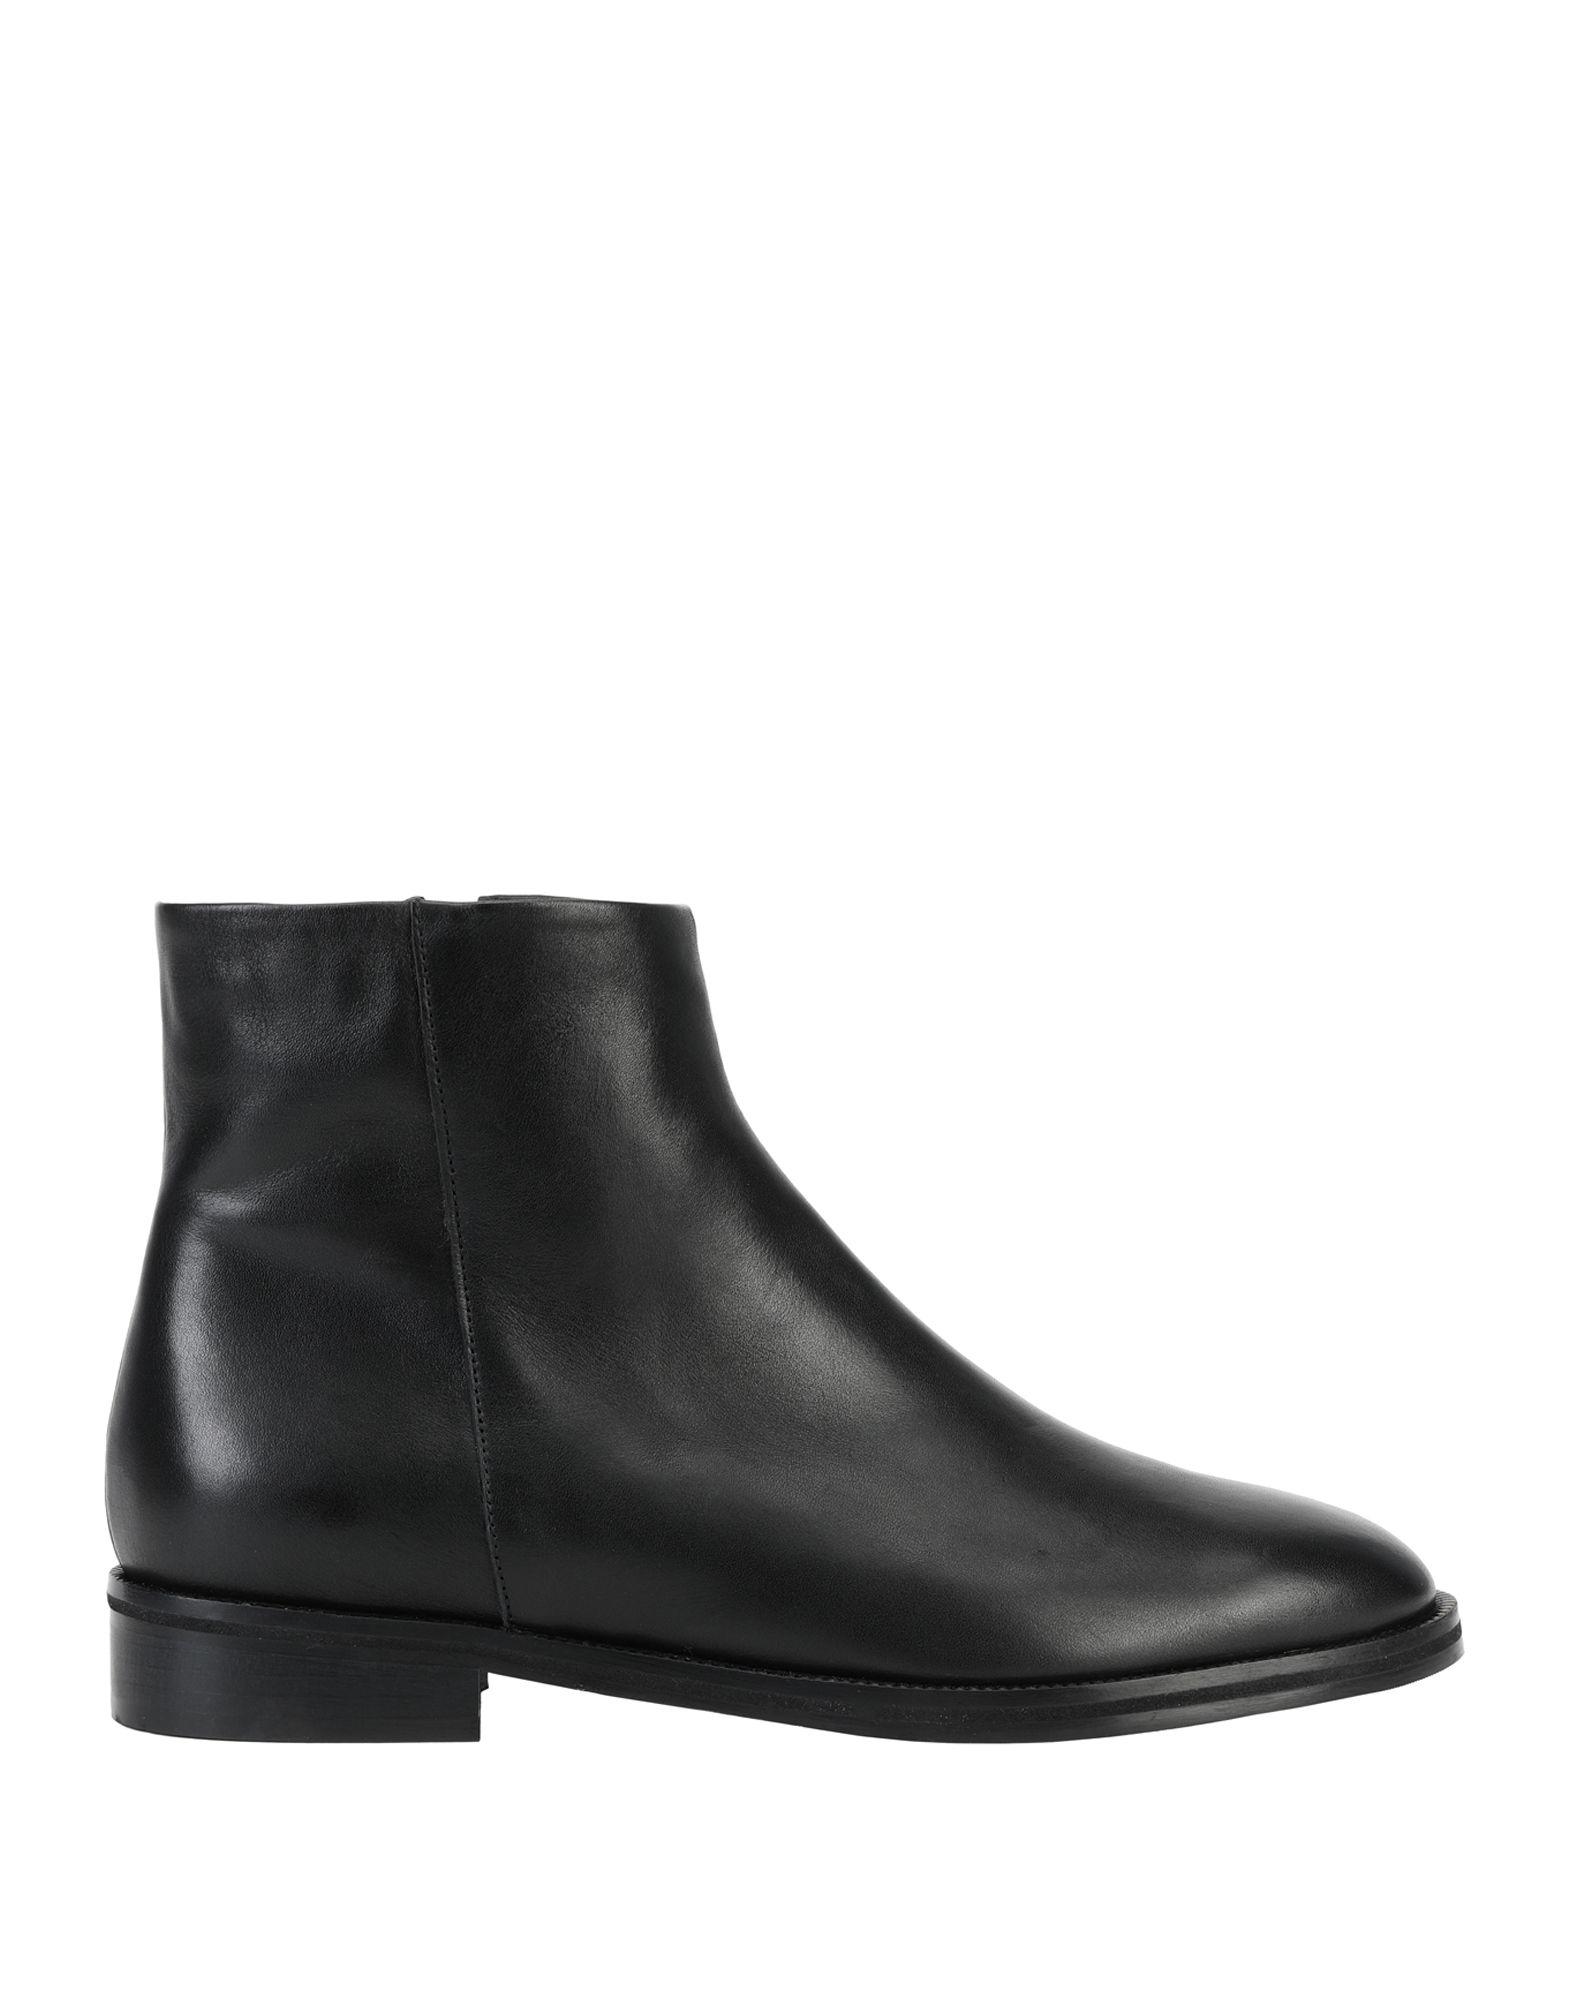 цена на 8 by YOOX Полусапоги и высокие ботинки